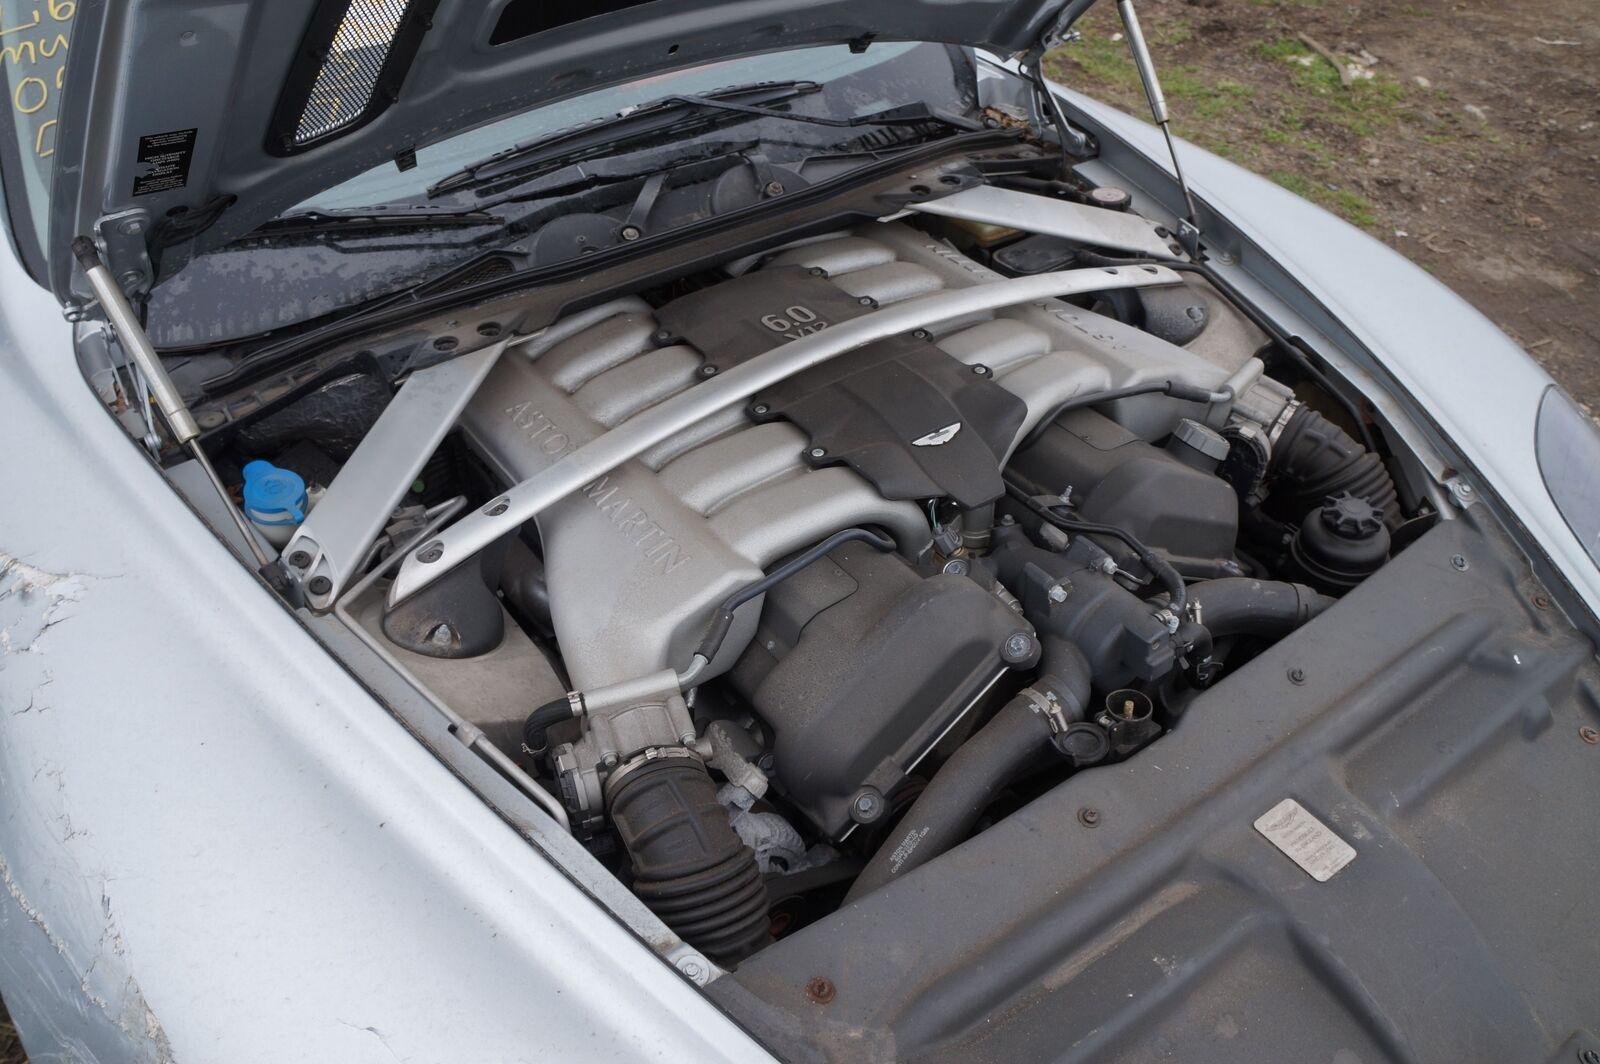 Engine Oil Pump 4g4e6621ad 5 9l V12 Aston Martin Db9 Rapide Dbs Vantage Virage